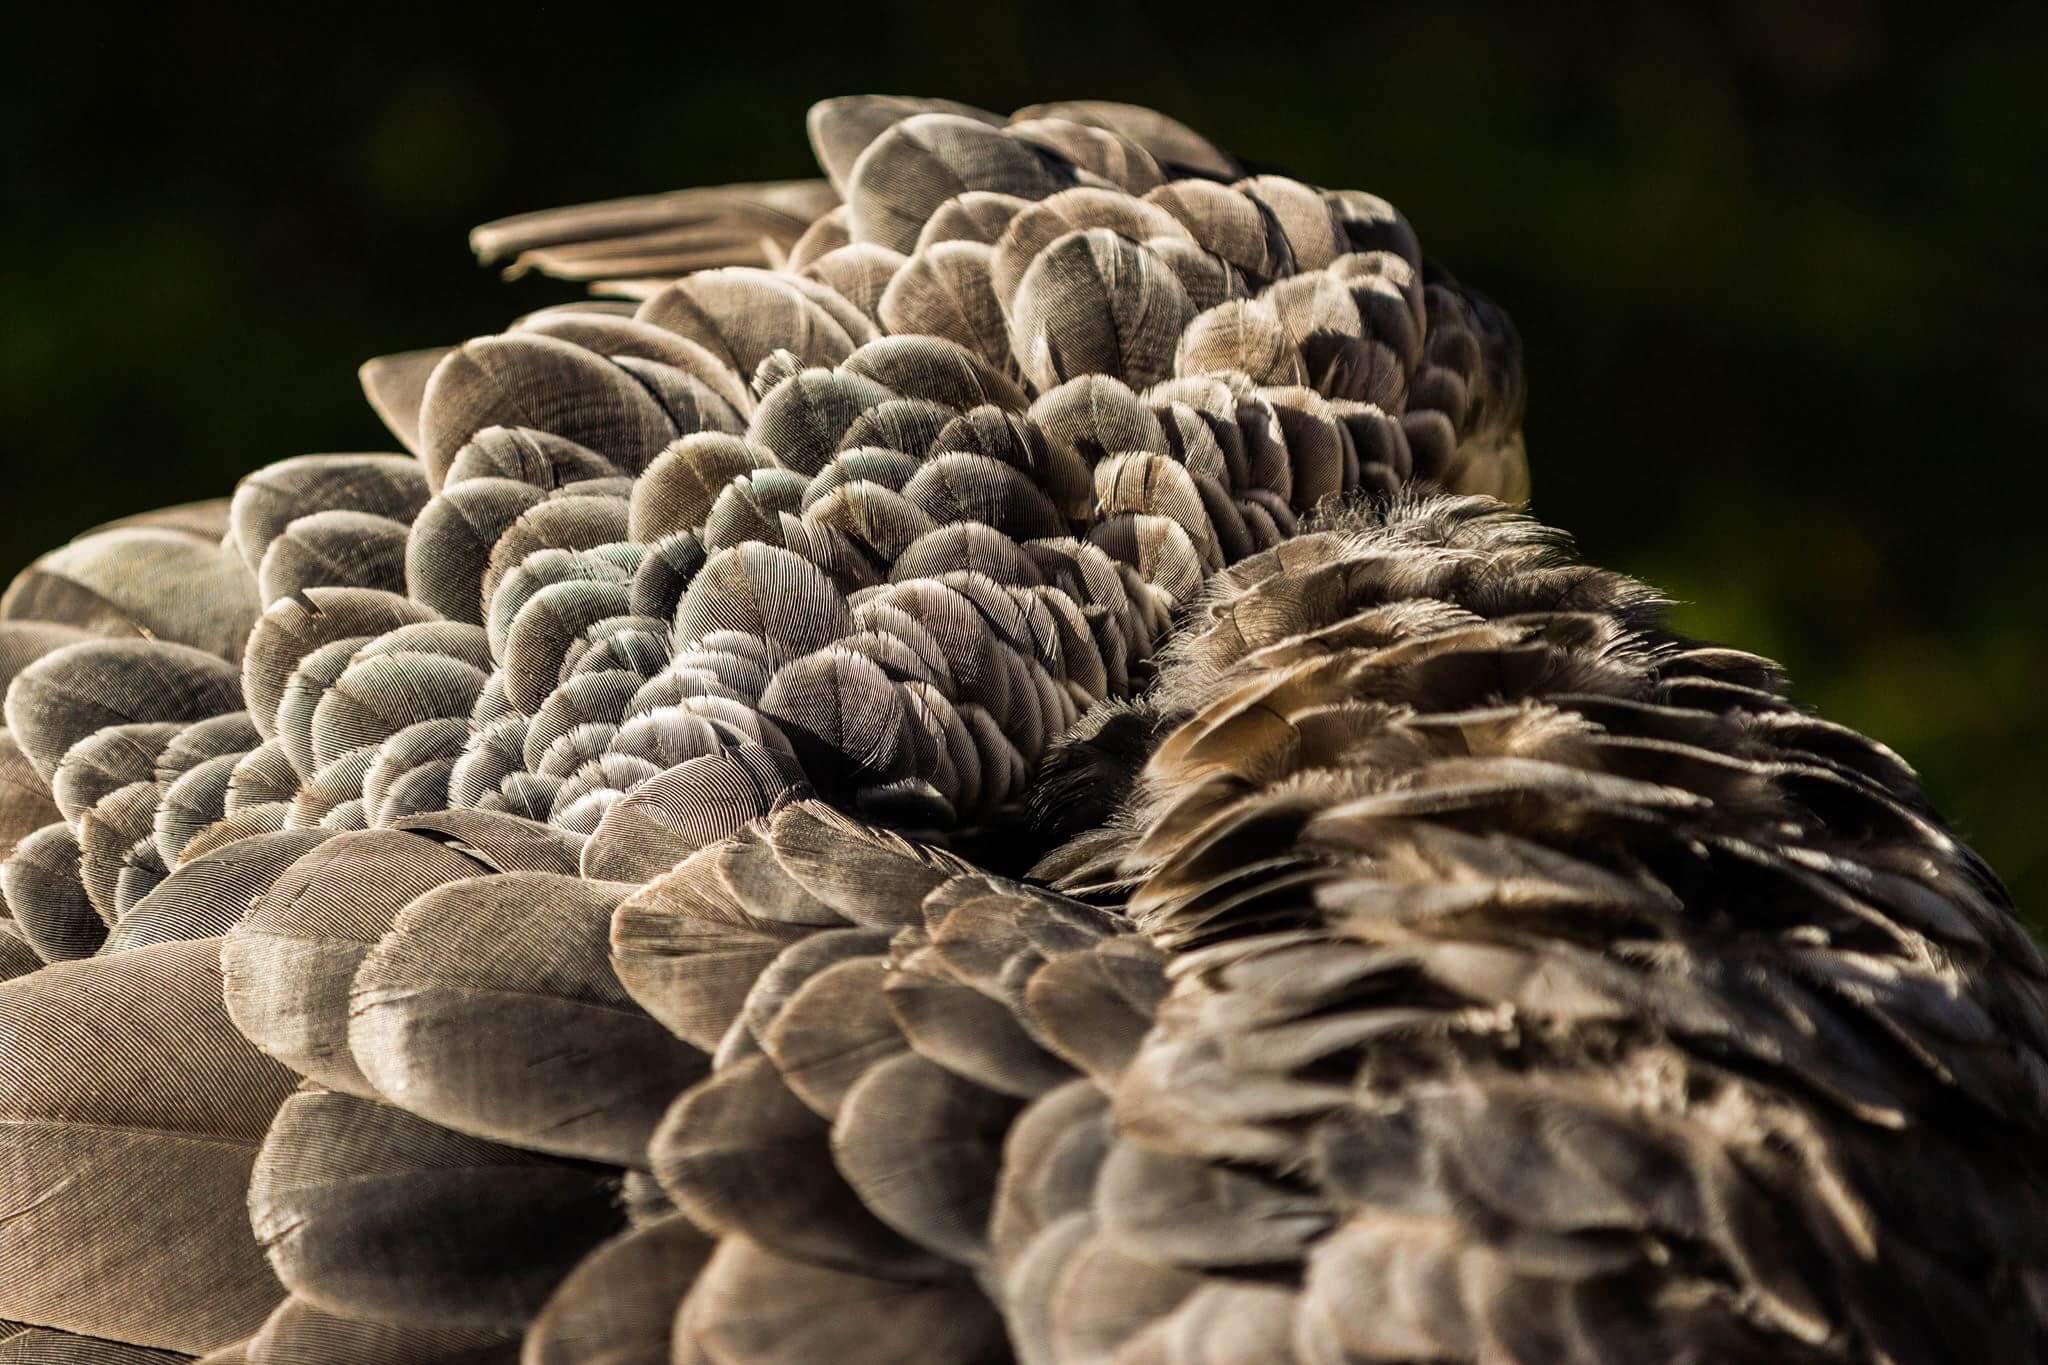 Peacock Feathers - Marci Konopa